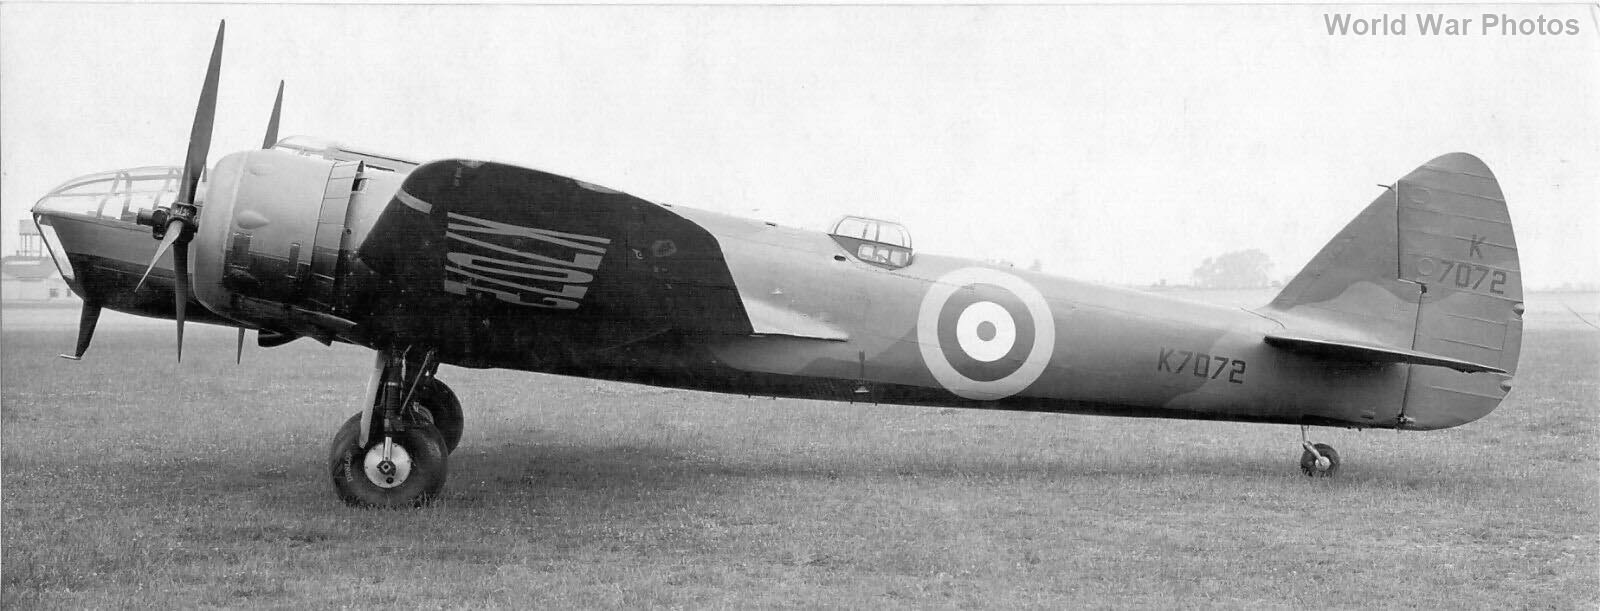 Bristol Blenheim K7072 1939